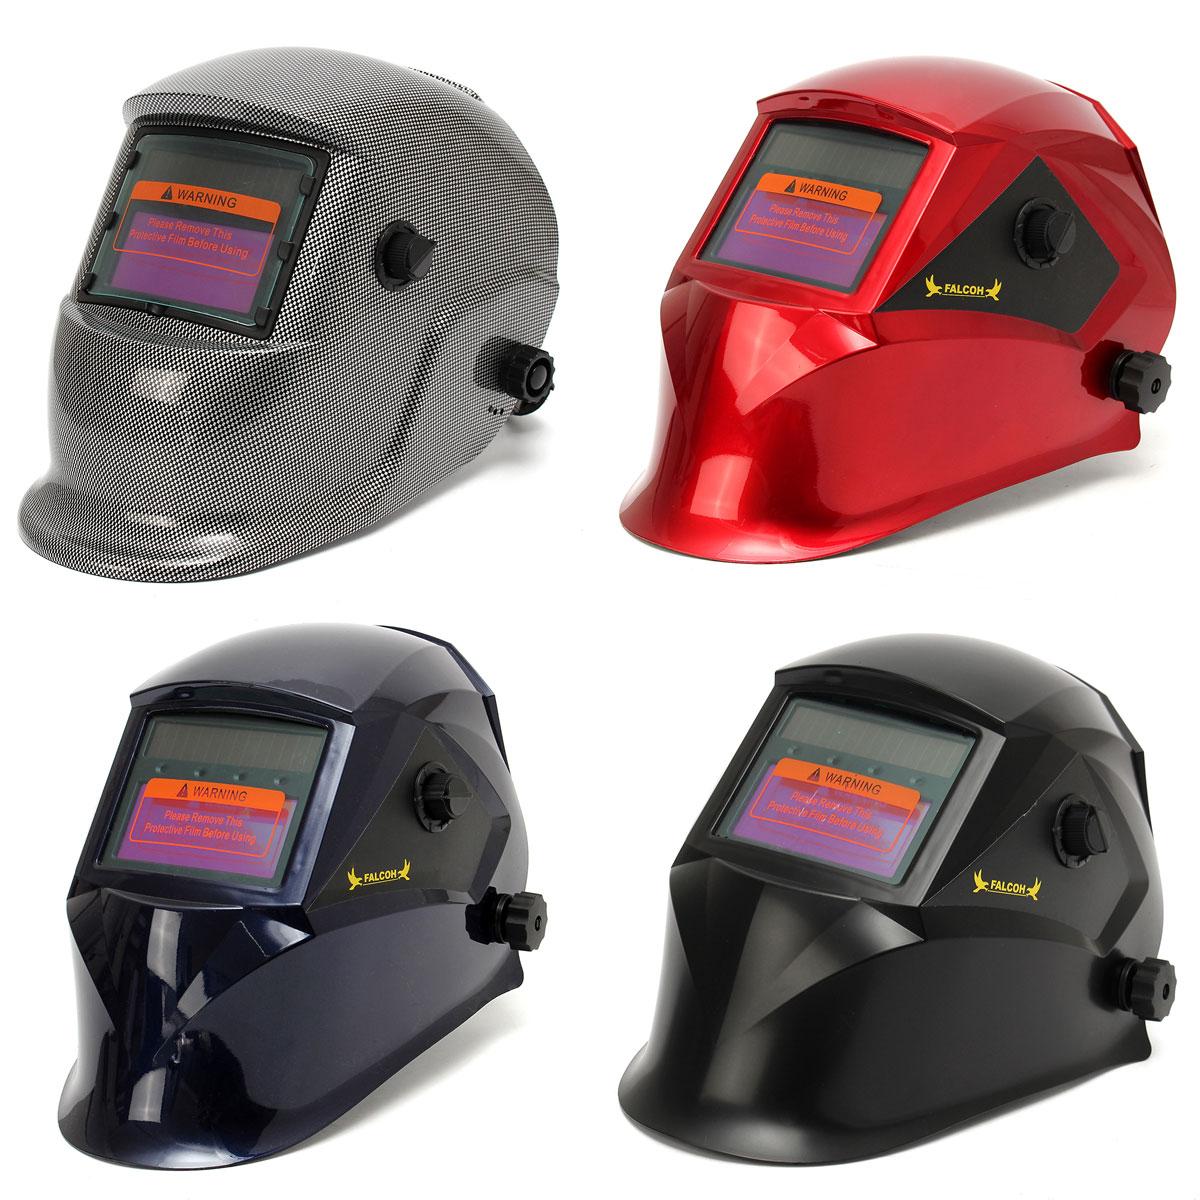 Auto Darkening Solar welders Welding Helmet Mask with Grinding Function 4 Colors (Eachine1) Fayetteville объявления б.у